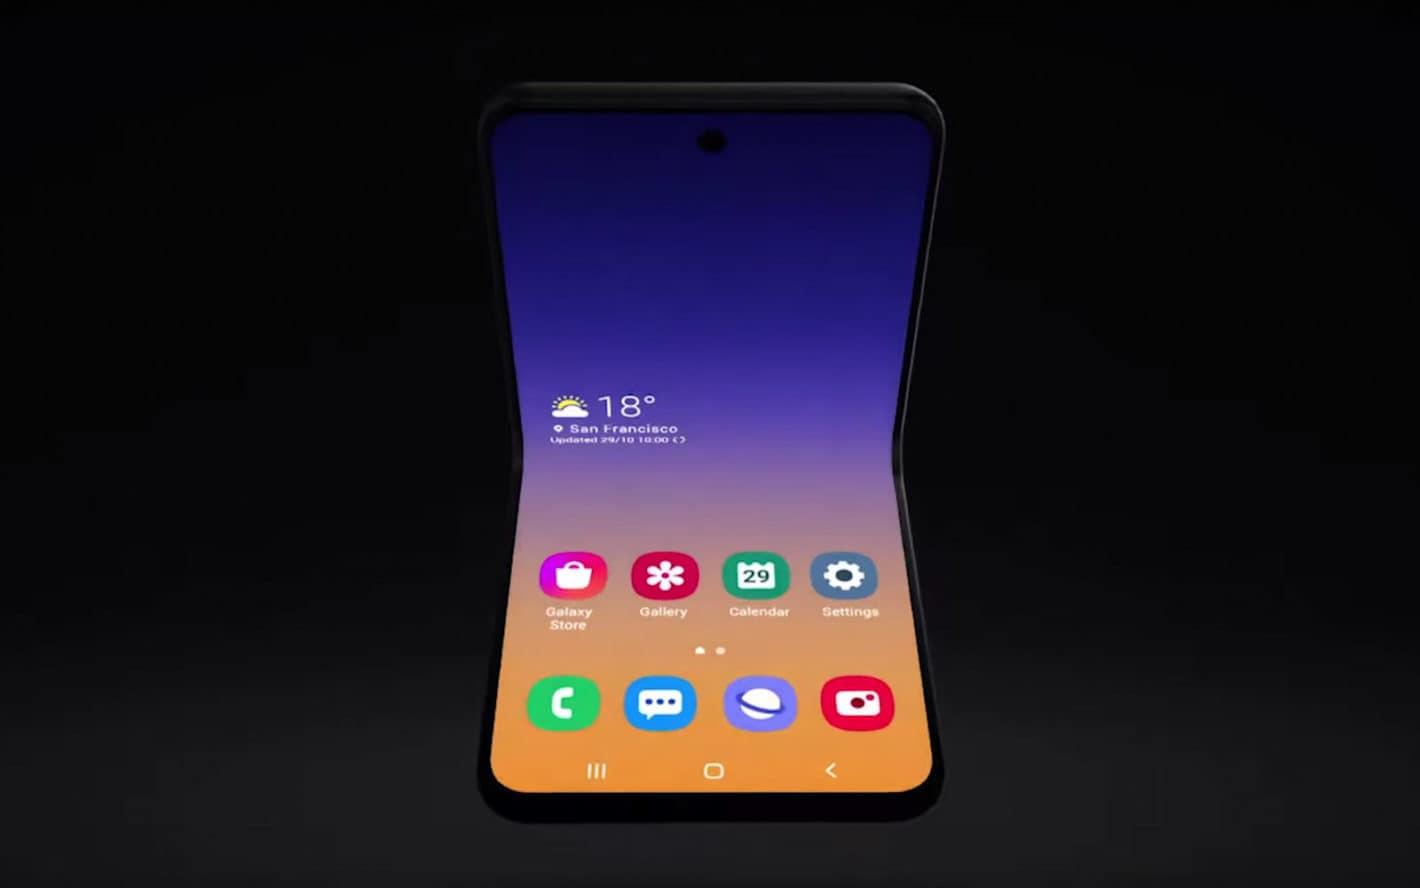 Samsung Galaxy Flip Fold SDC2019 promo video